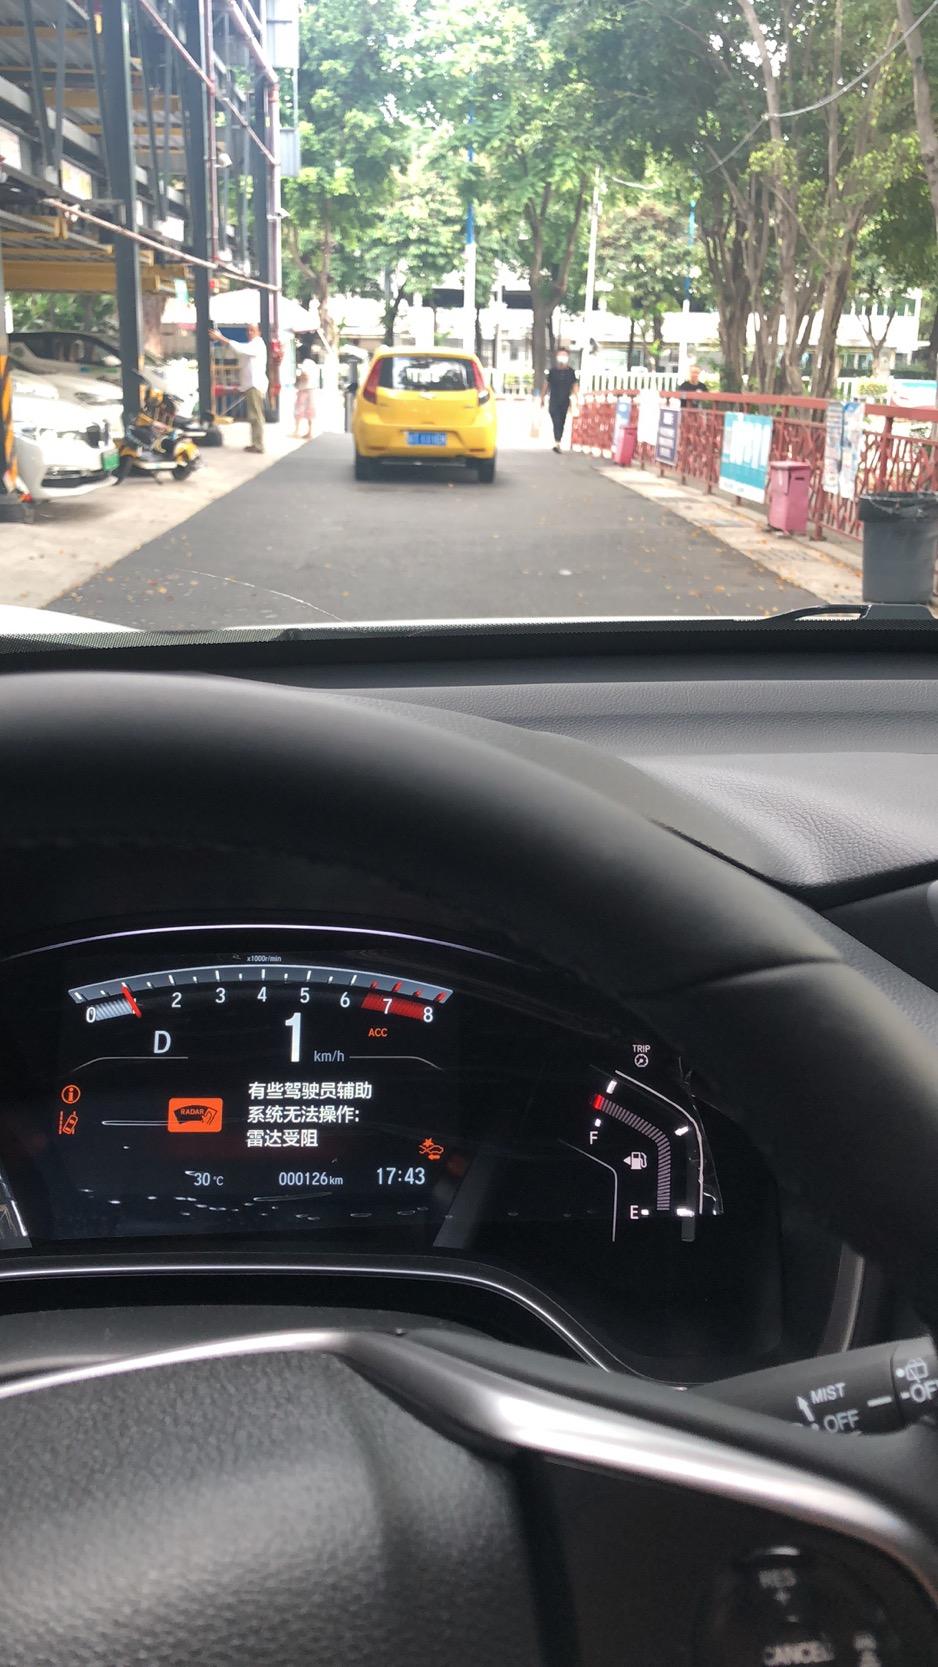 本田-CR-V,新车雷达受阻,acc有问题